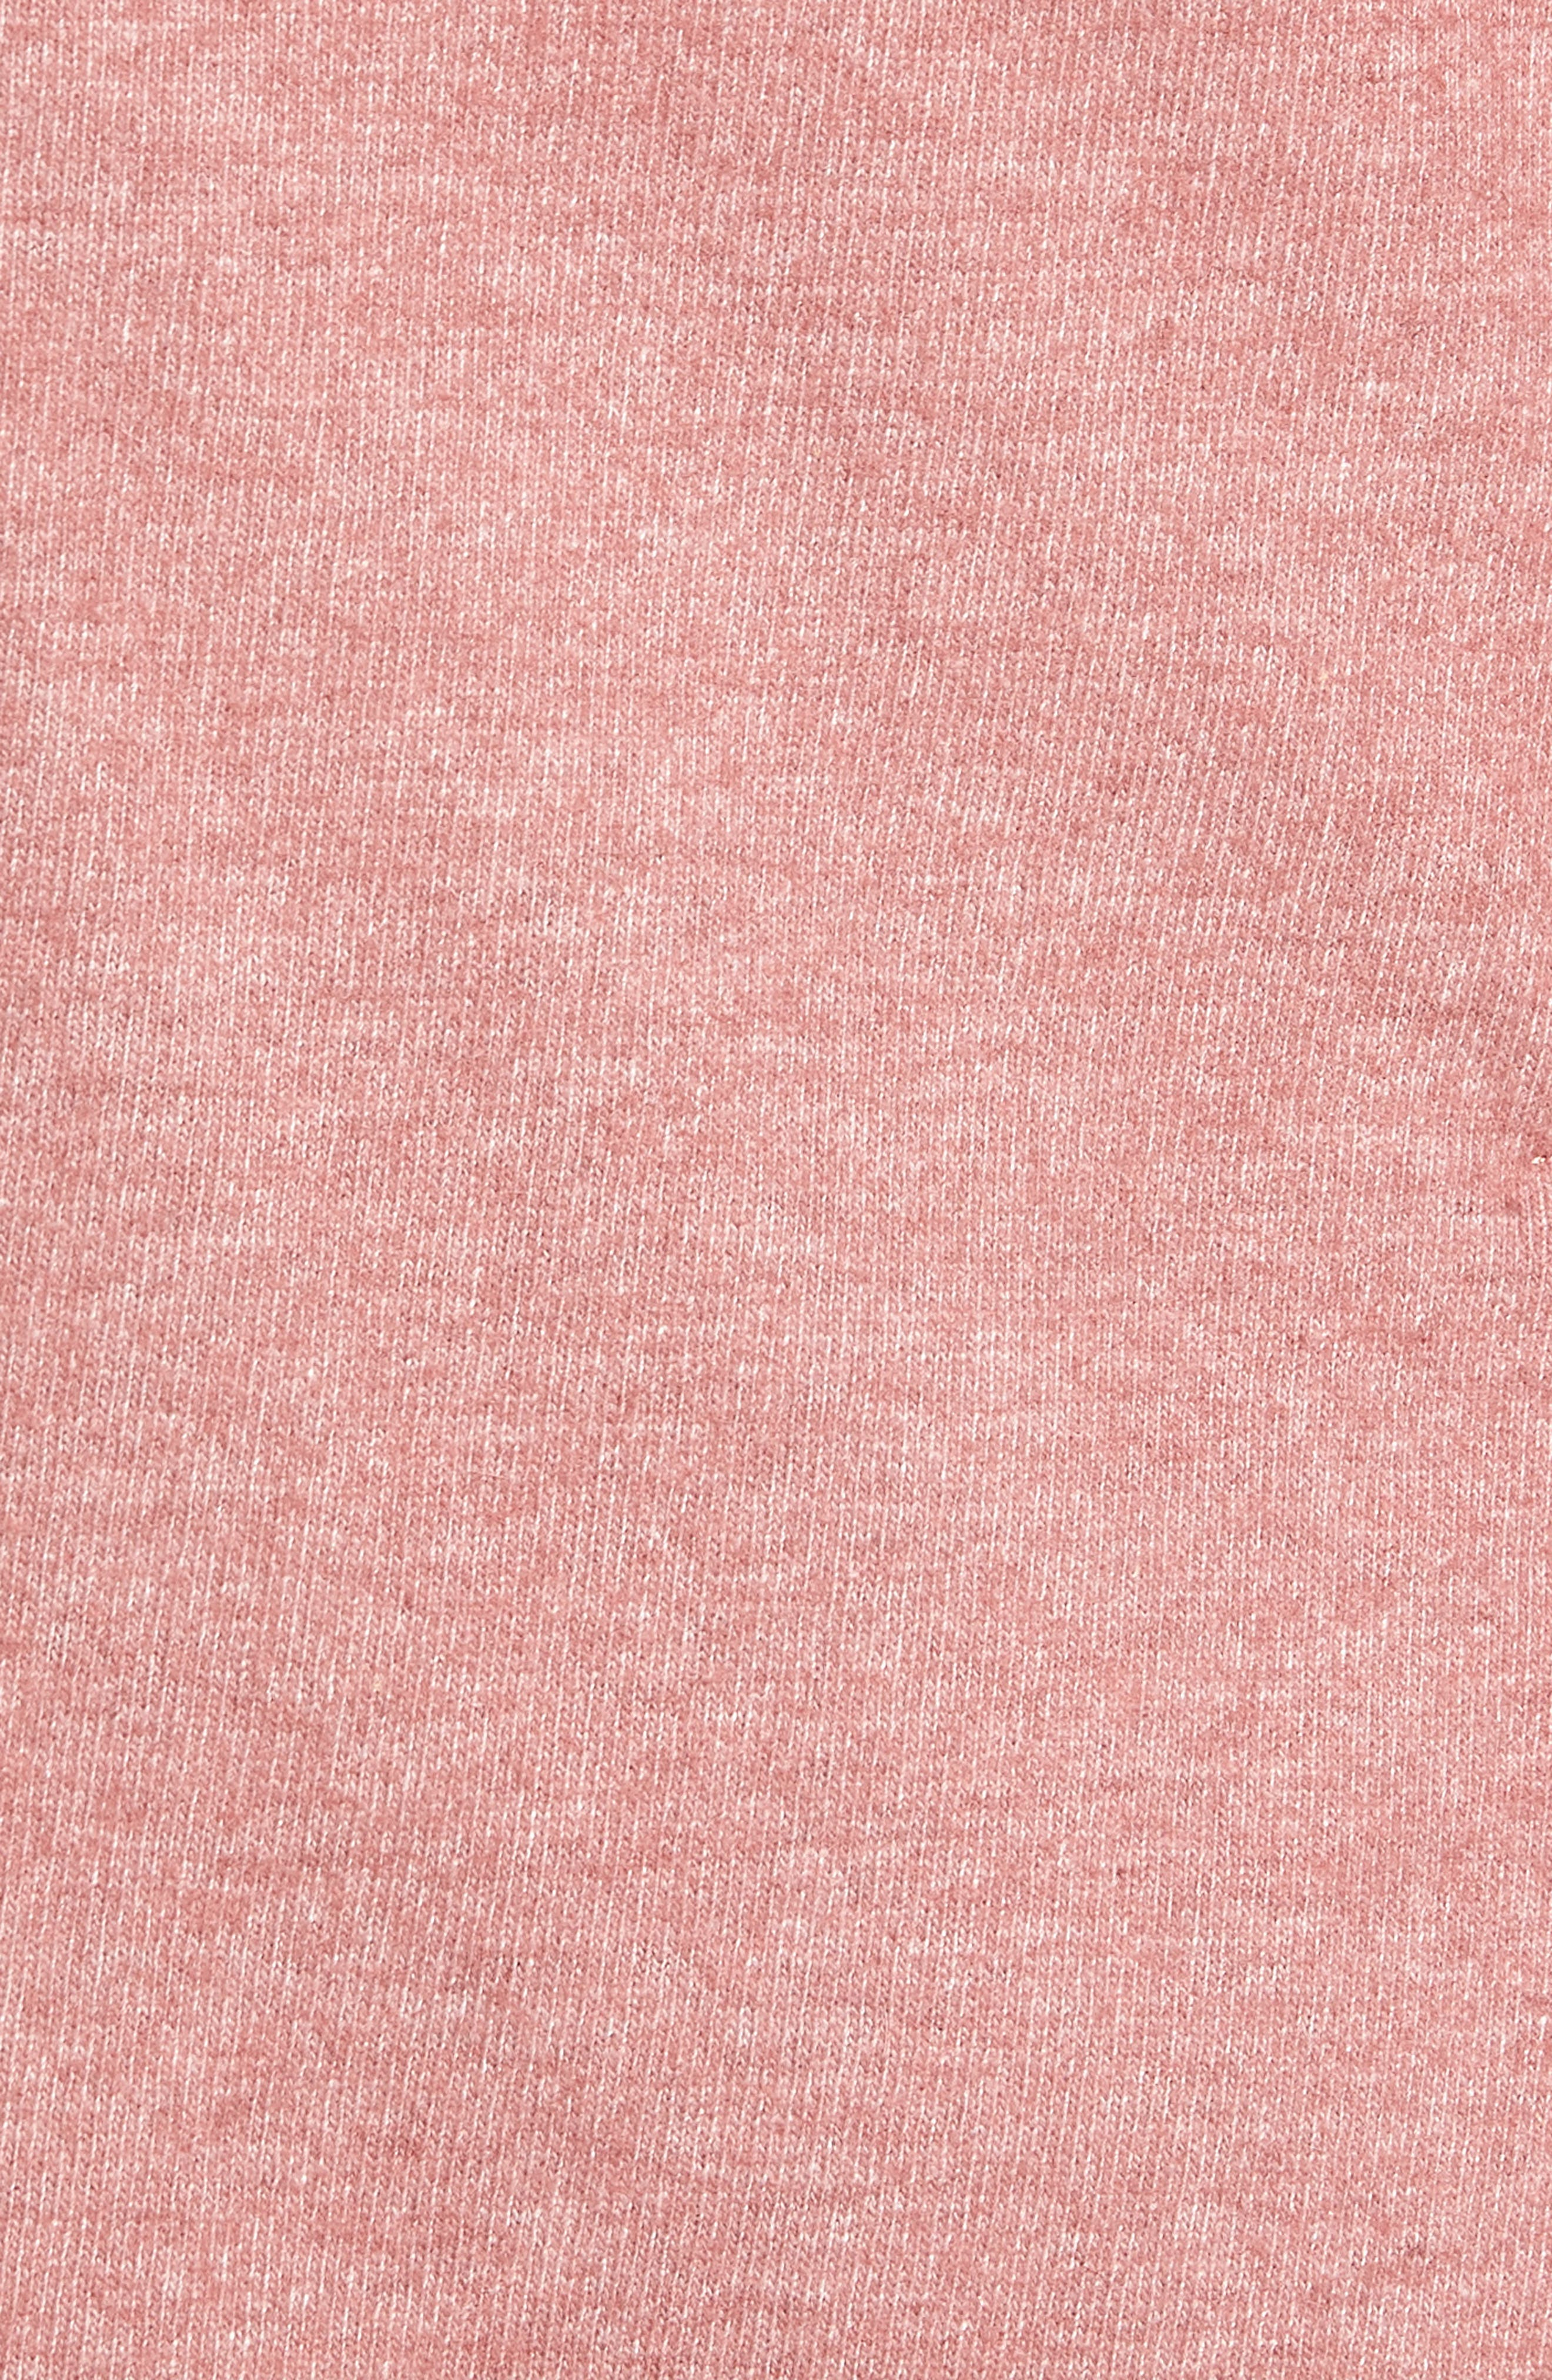 Regular Fit Knit Wool Blend Sport Coat,                             Alternate thumbnail 6, color,                             PINK